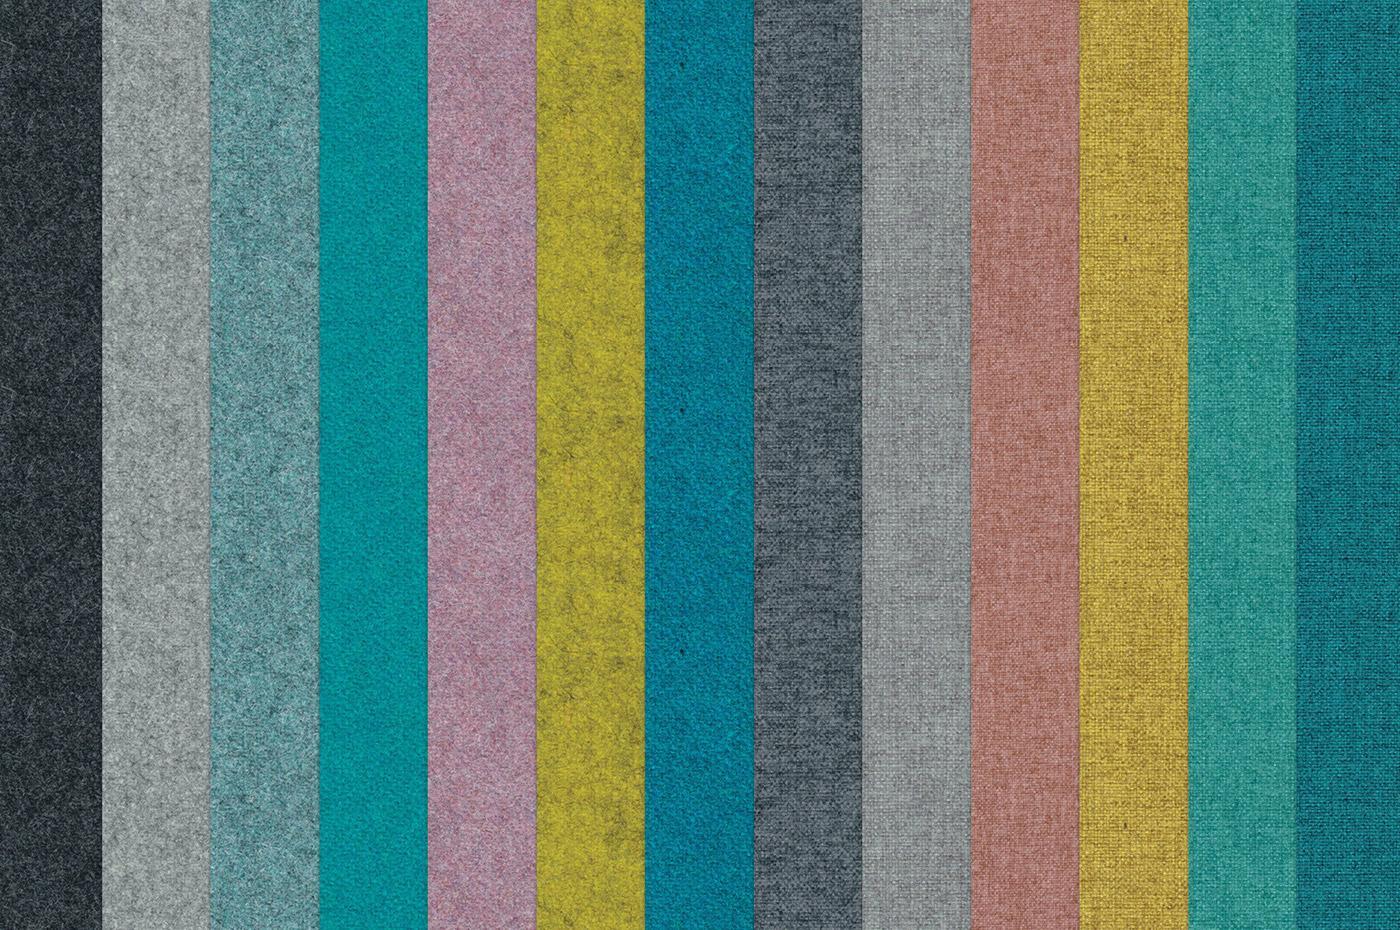 Oot-Oot Studio Fabric Sample Set